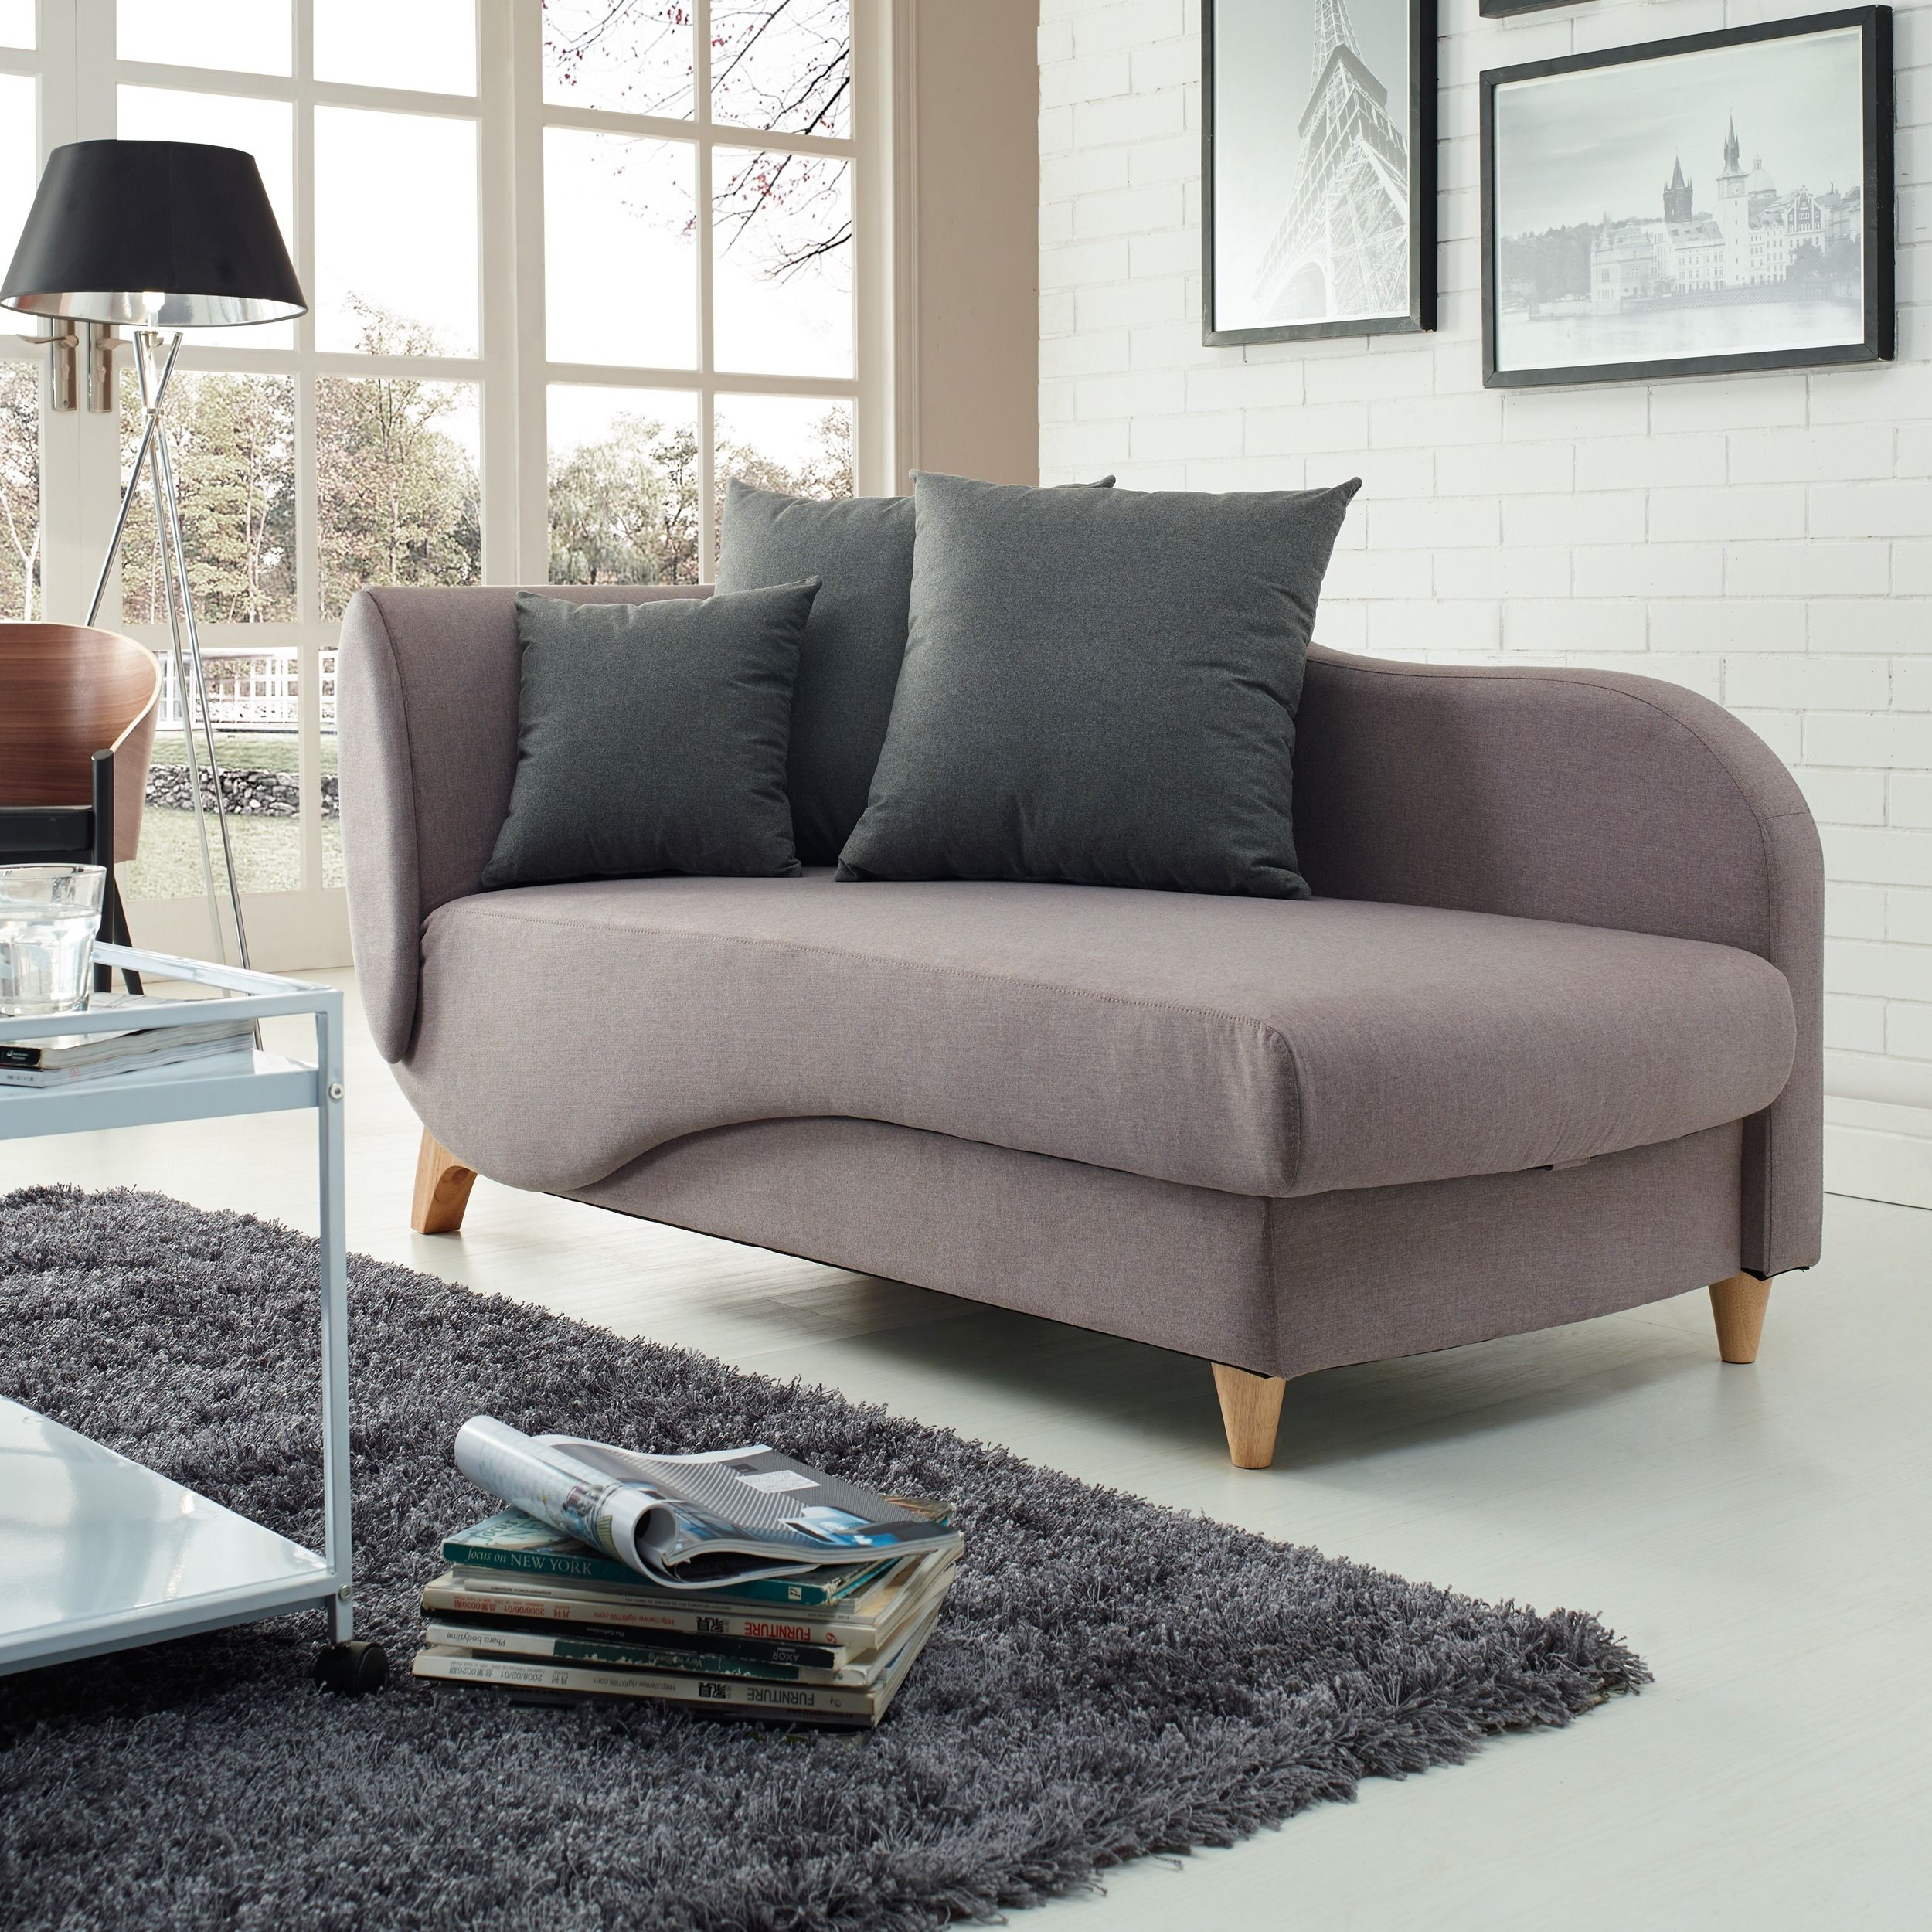 Sleeper Sofa For Less